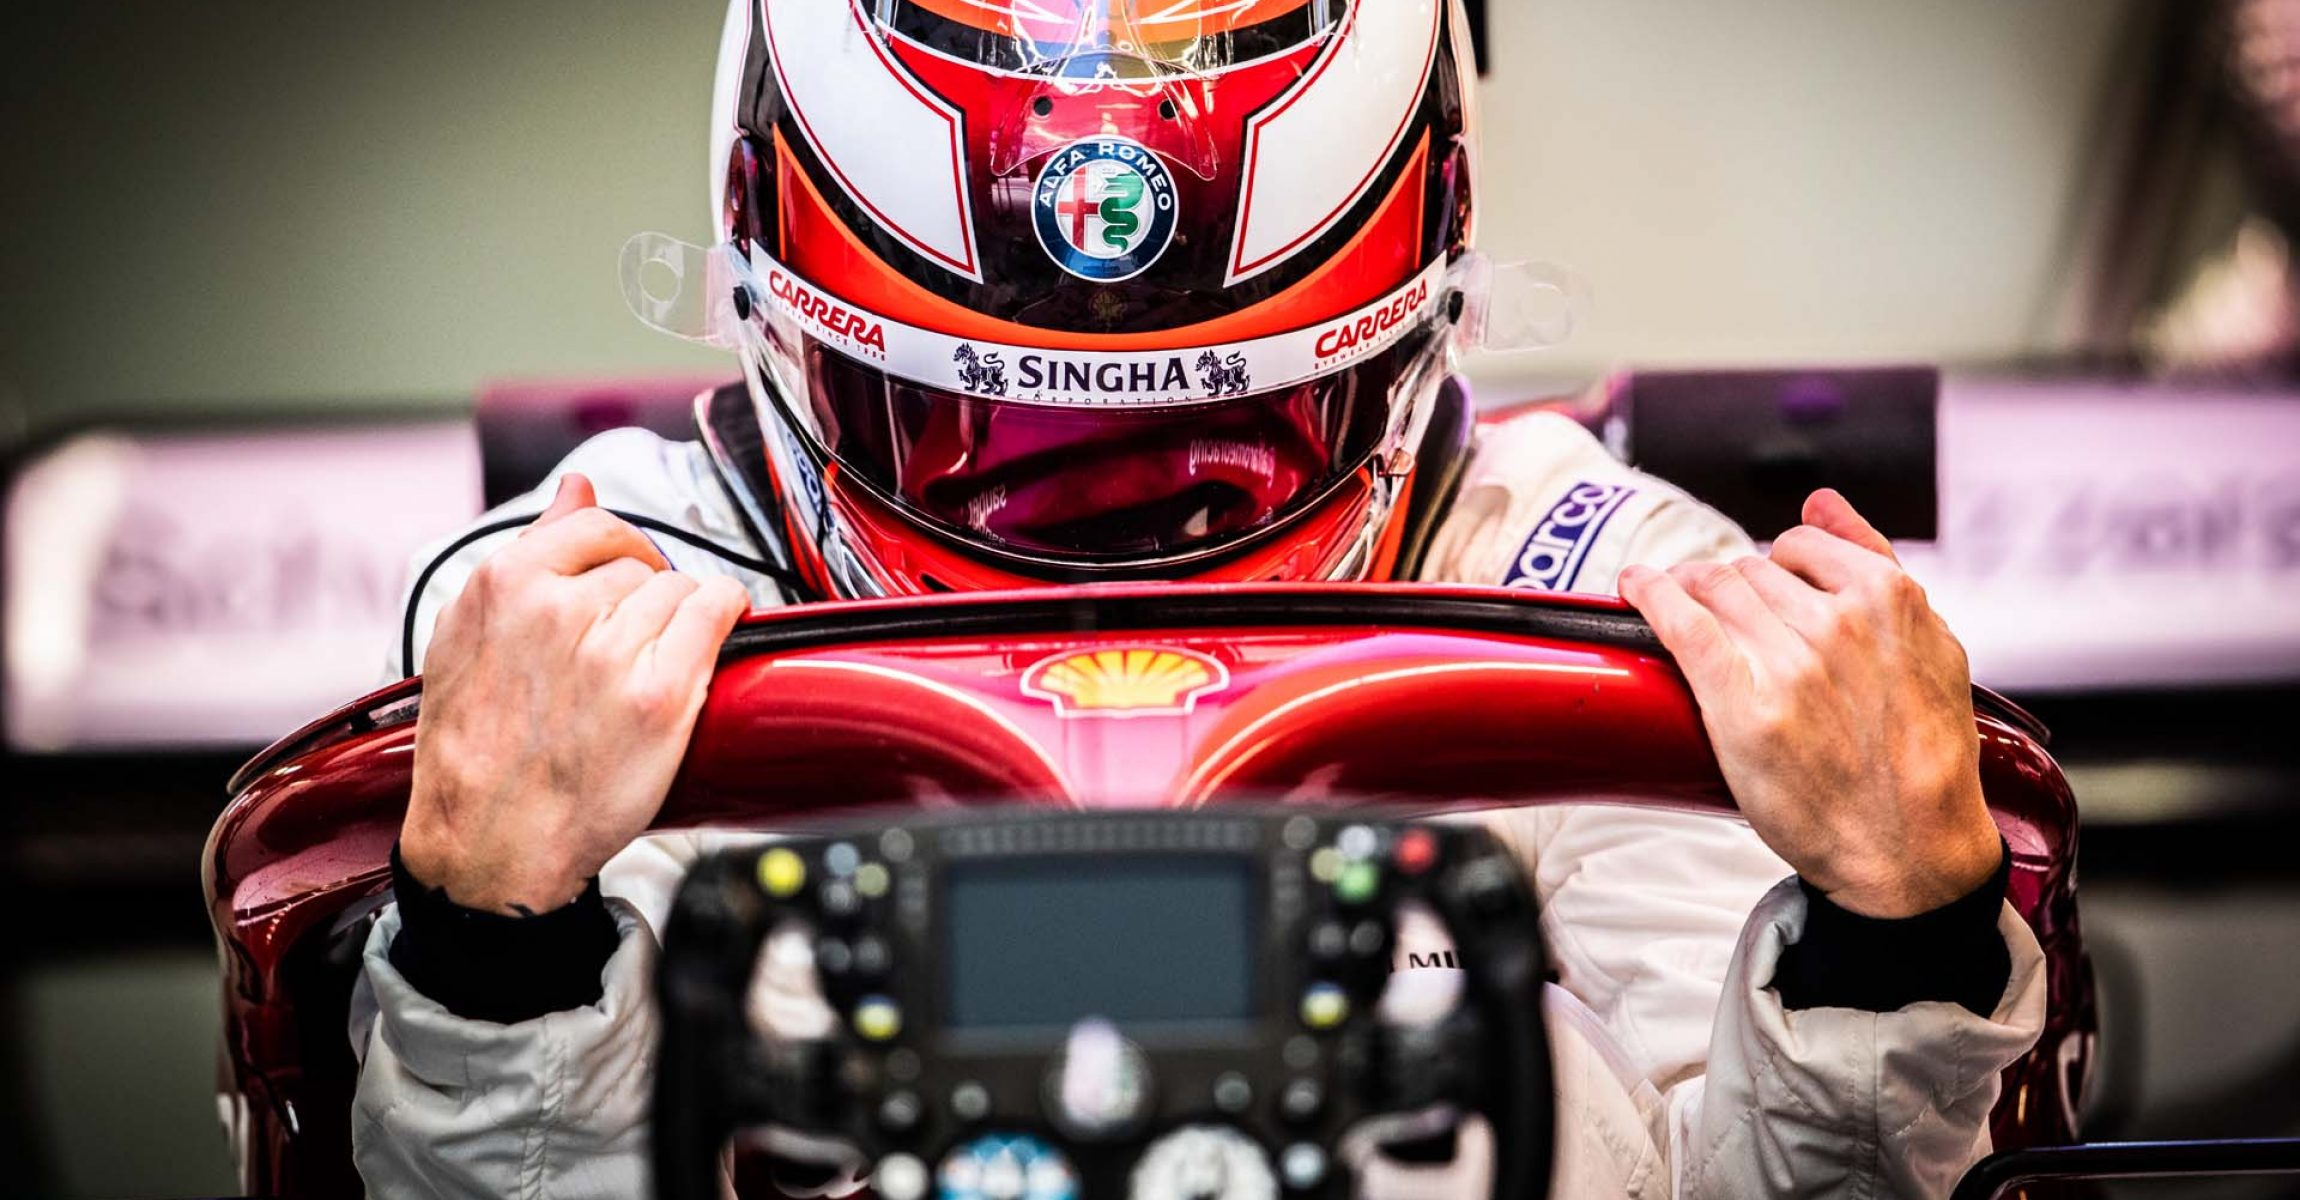 RAIKKONEN Kimi (fin), Alfa Romeo Racing C38, portrait during the 2019 Formula One World Championship, Russia Grand Prix from September 26 to 29 in Sotchi, Russia - Photo Antonin Vincent / DPPI